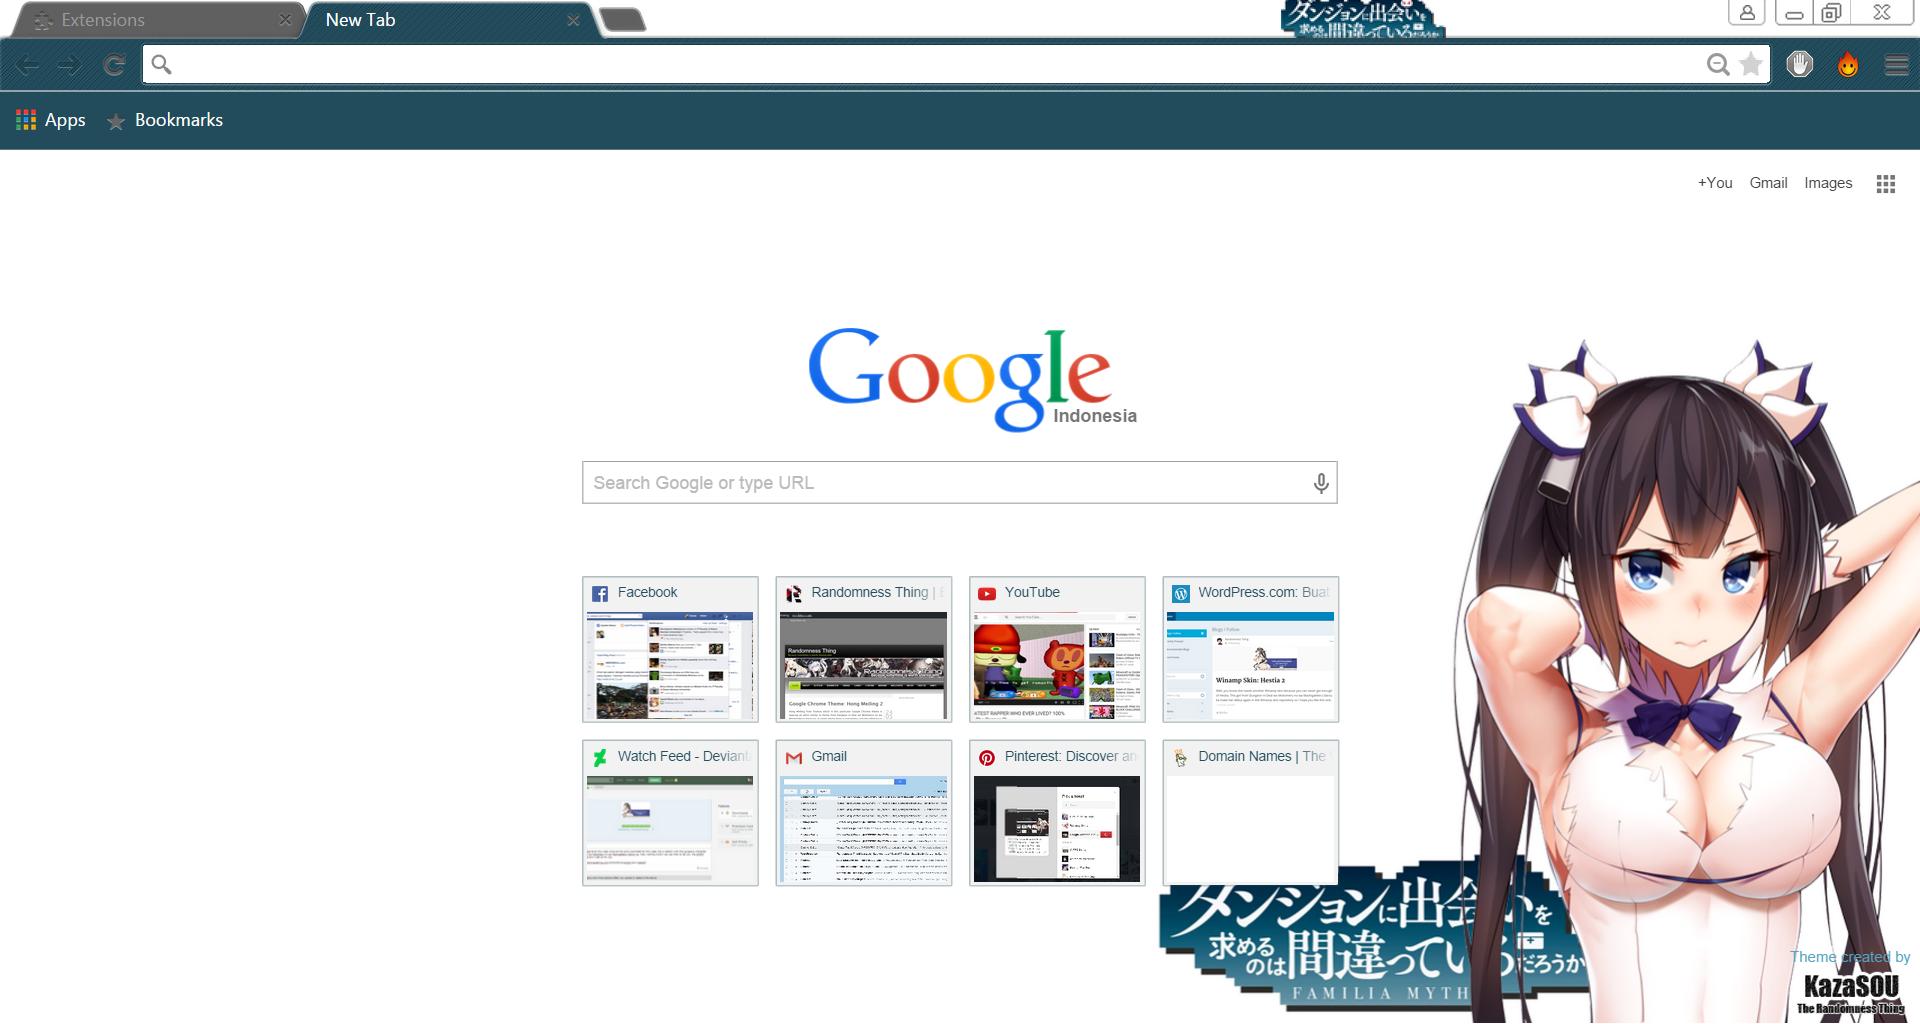 Google themes hatsune miku - Hestia 3 Chrome By Kaza Sou